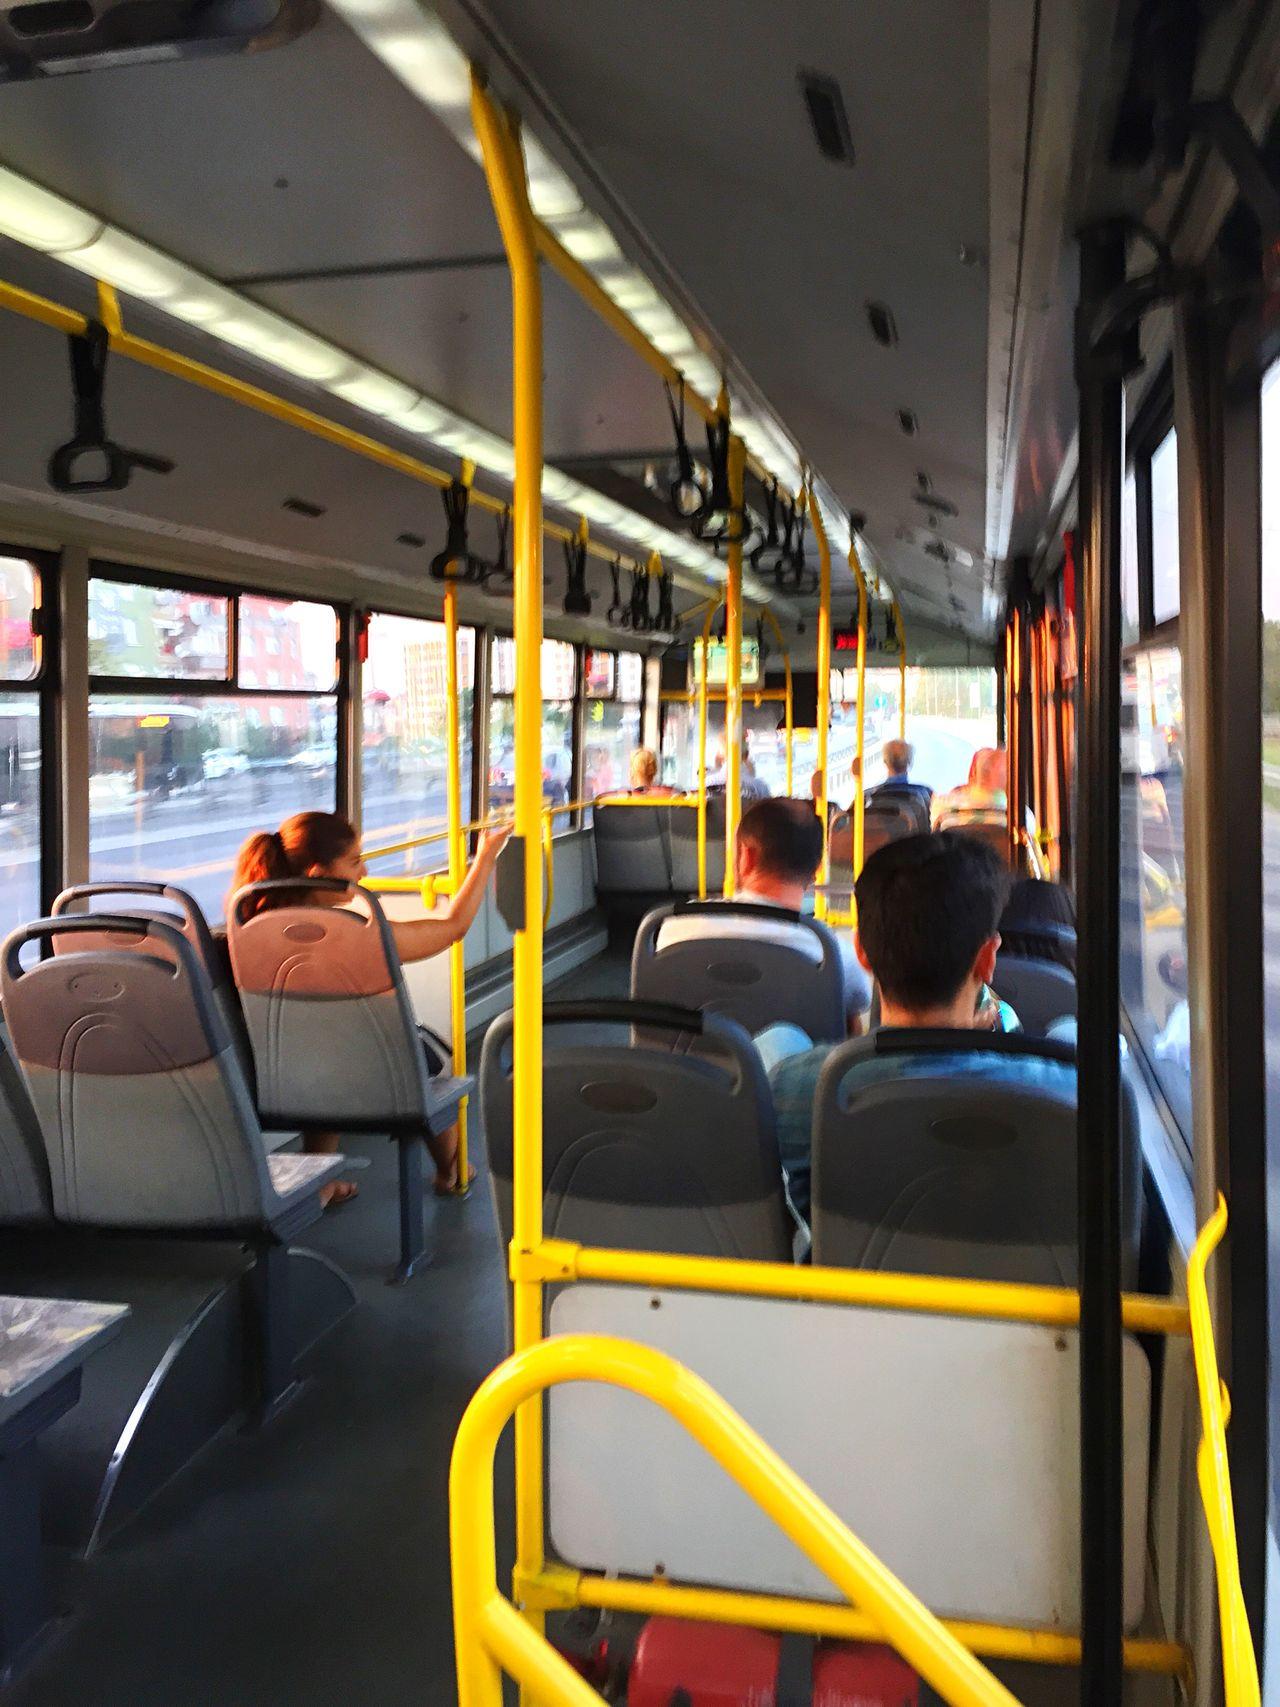 In the bus. Istanbul. Turkey Istanbul Istanbuldayasam Istanbul Turkey Istanbul City Türkiye Otobus Iett City Sehir